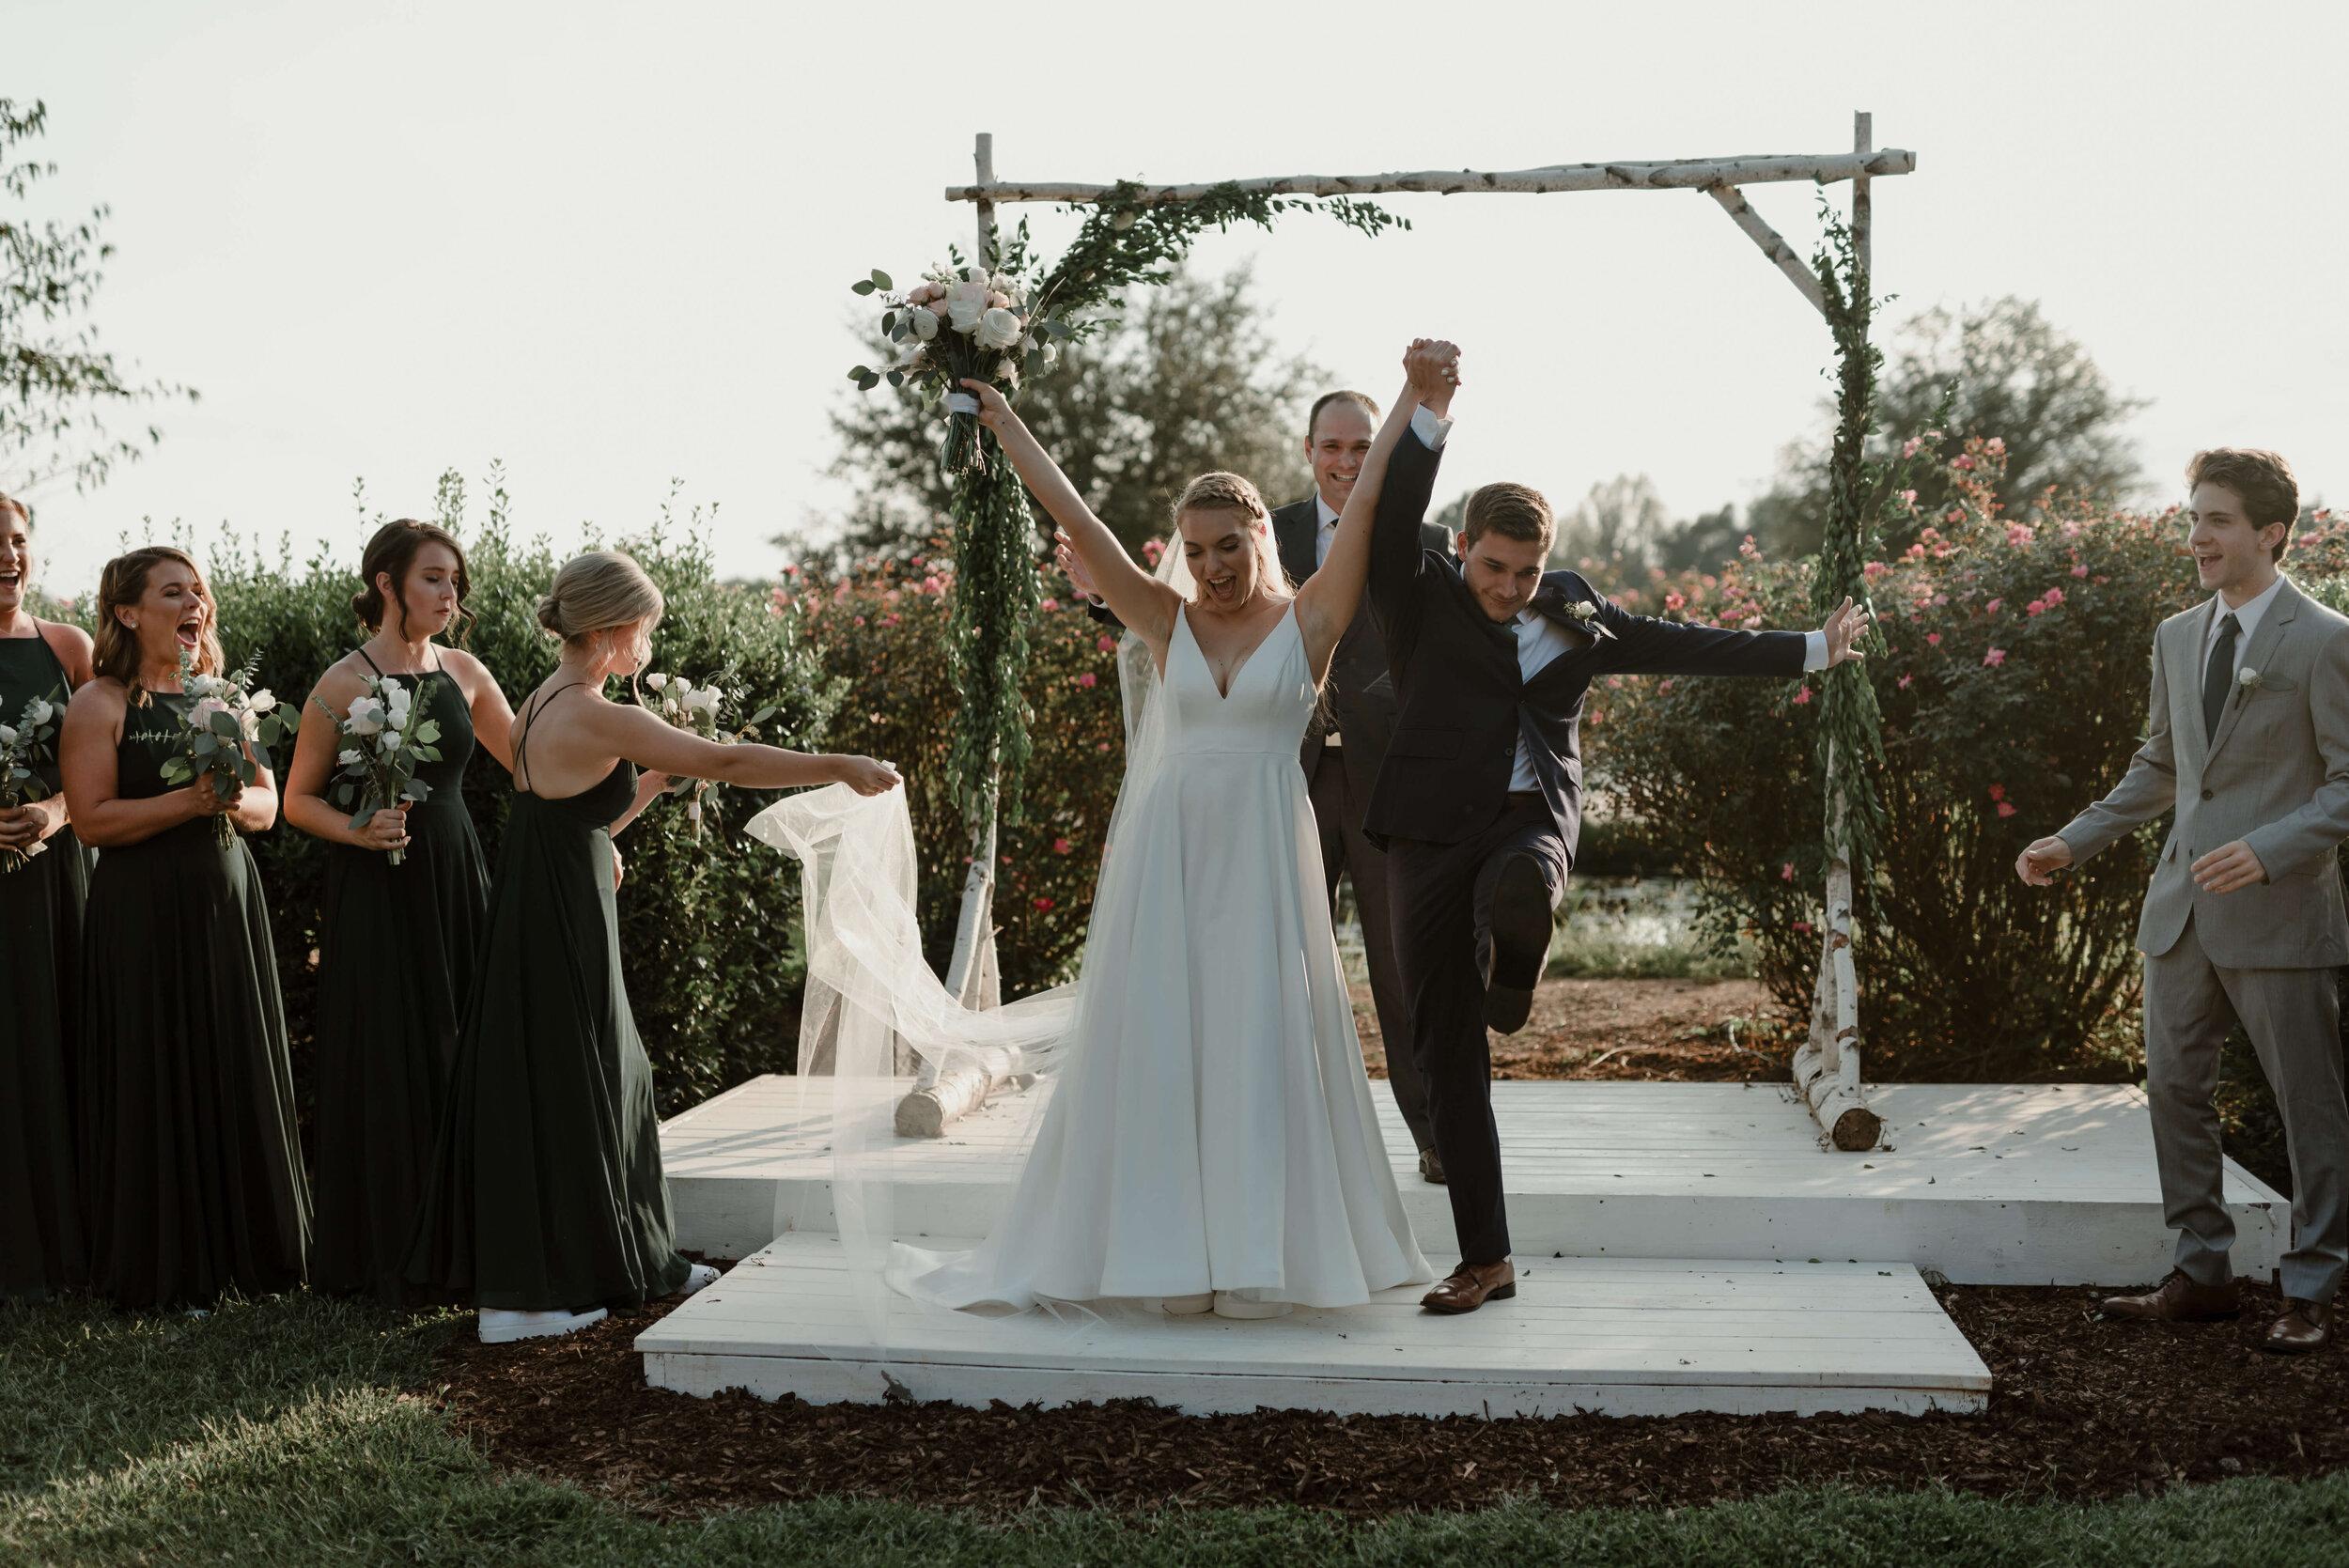 RALEIGH_WEDDING_GABBY_AND_SMITTYDSC_7741.jpg